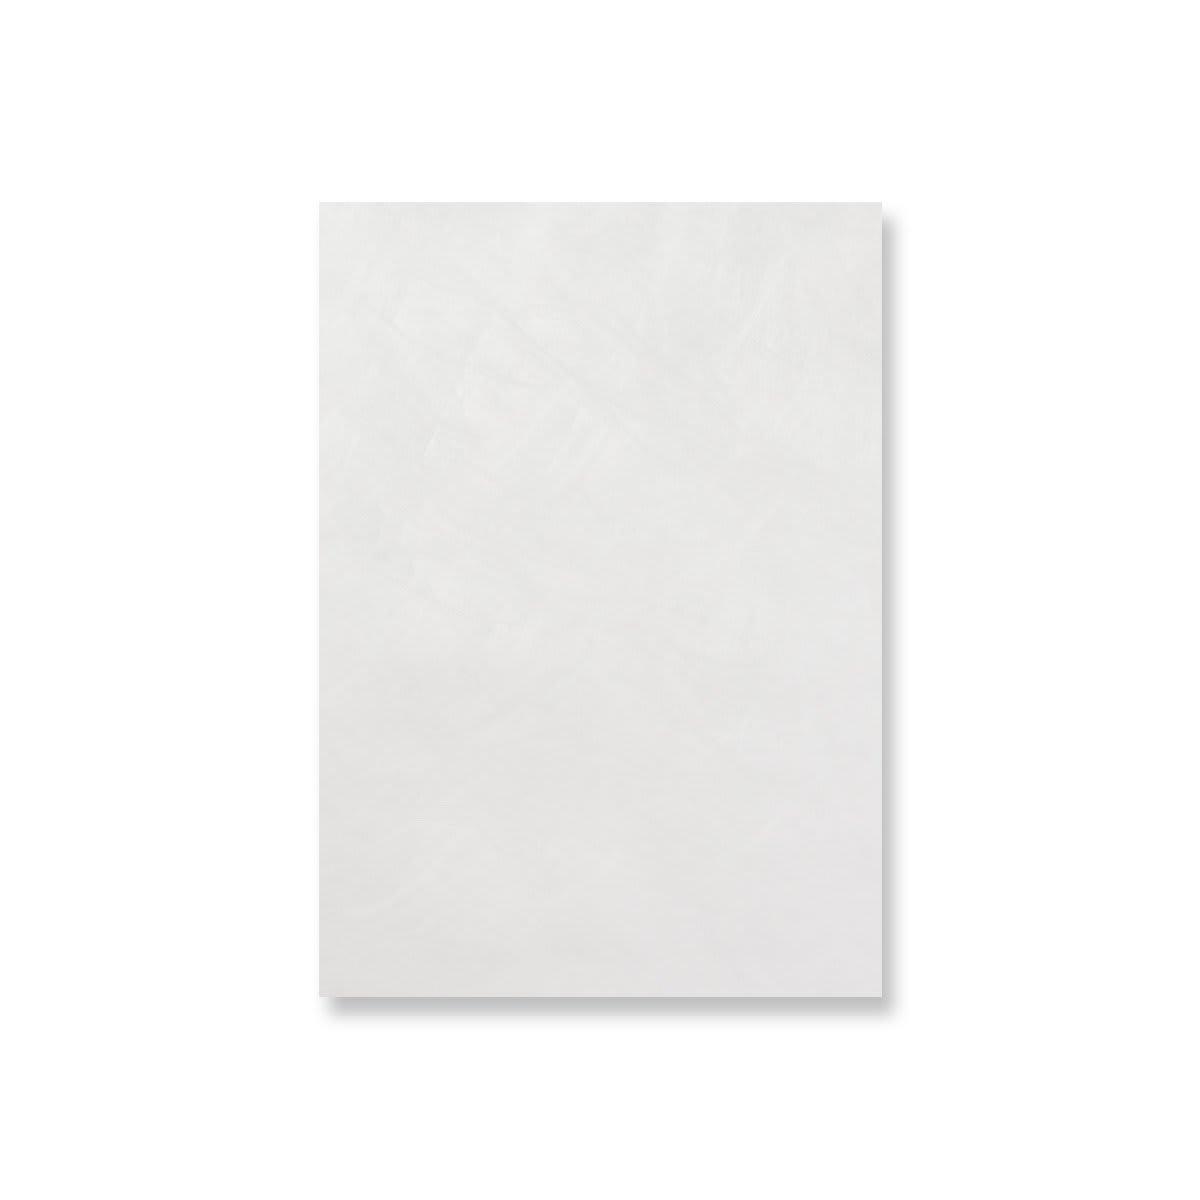 353 x 250mm WHITE TYVEK ENVELOPES